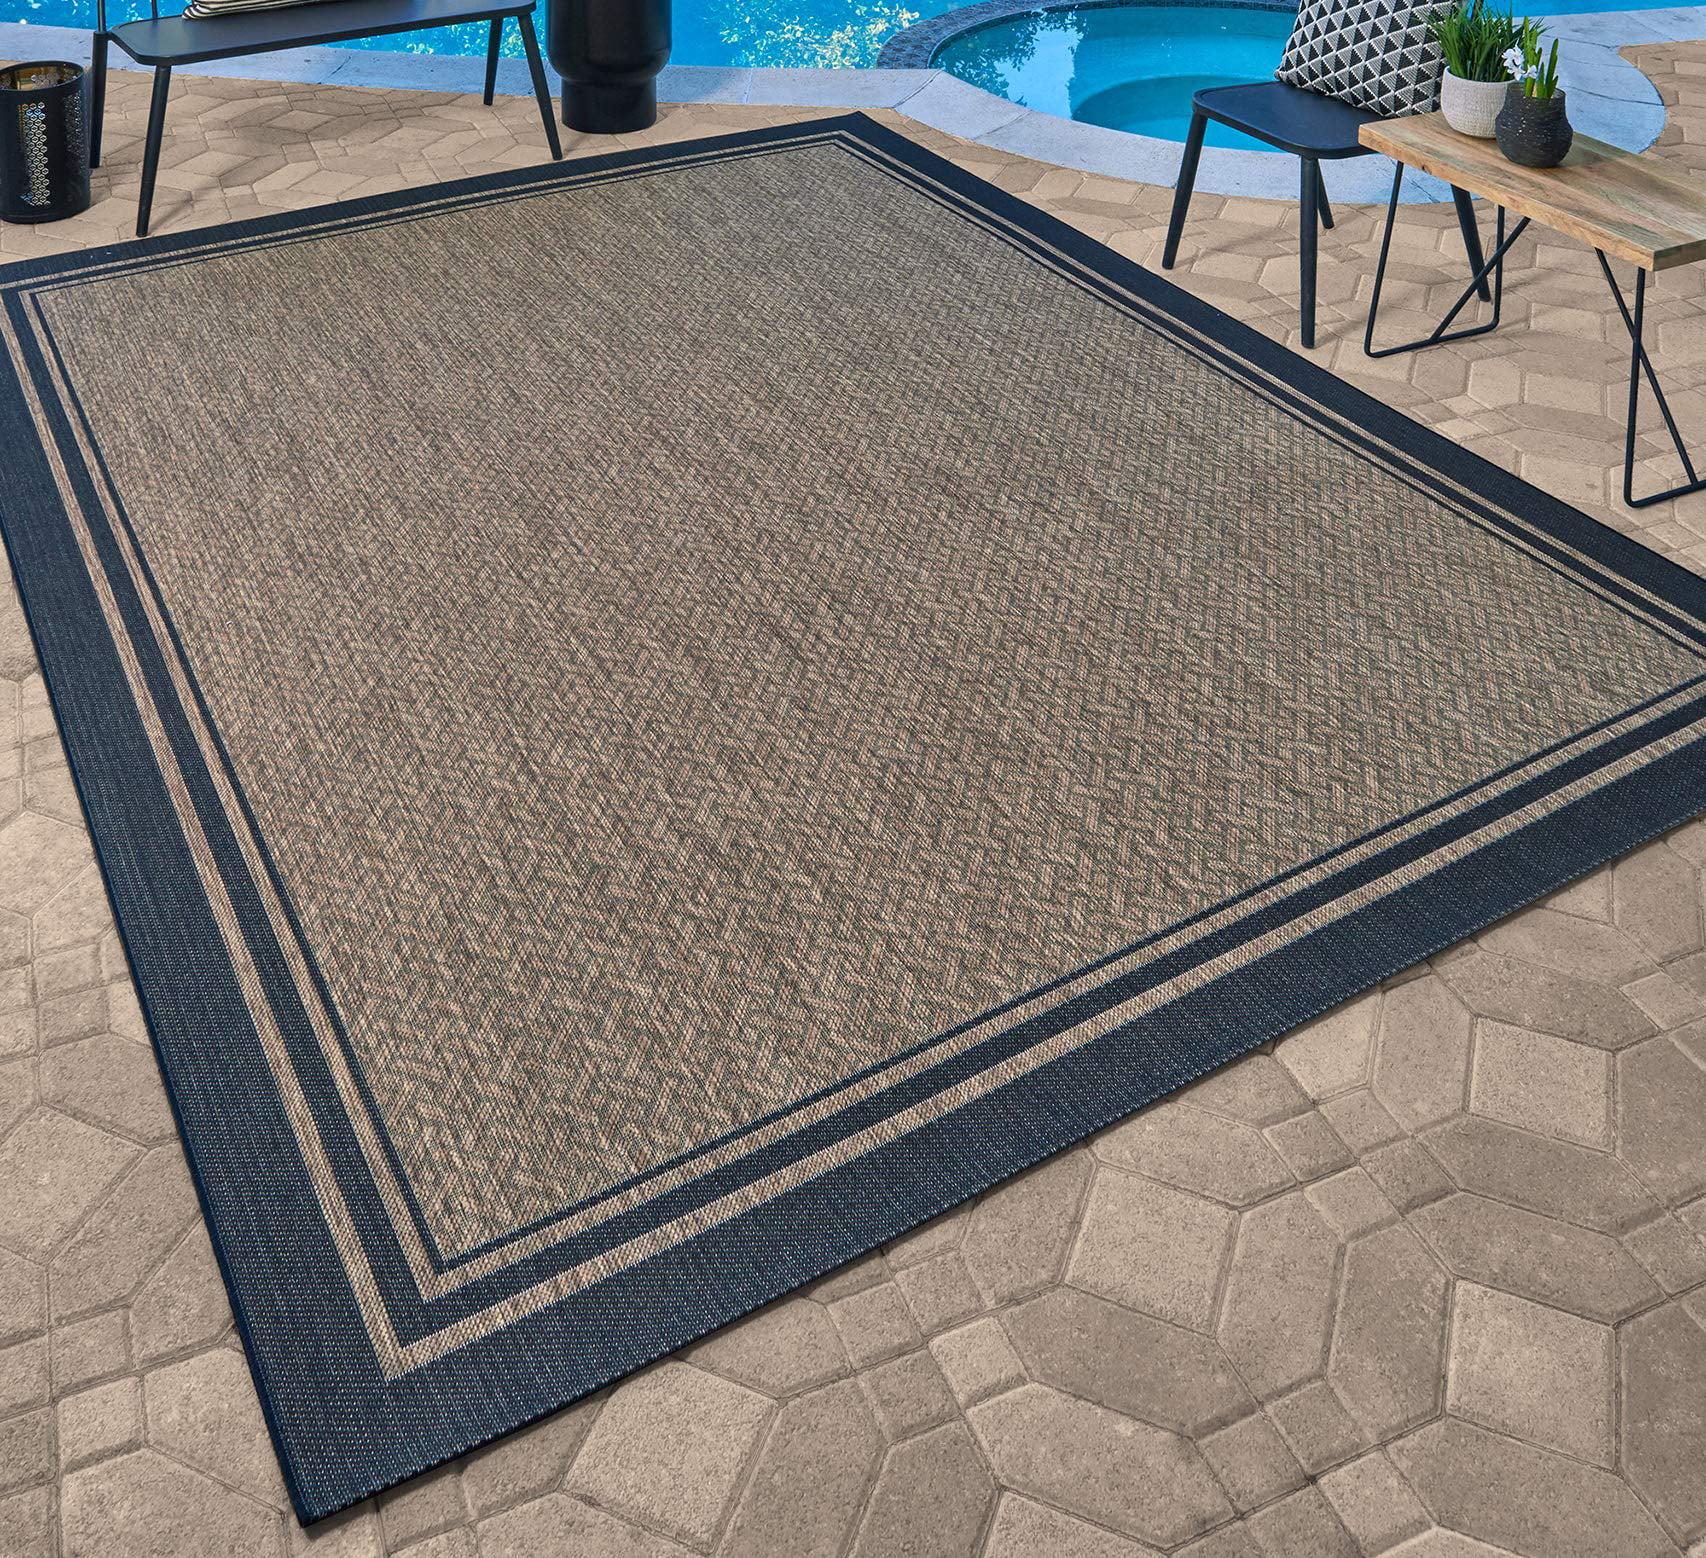 gertmenian 21358 nautical tropical carpet outdoor patio rug 5x7 standard border black